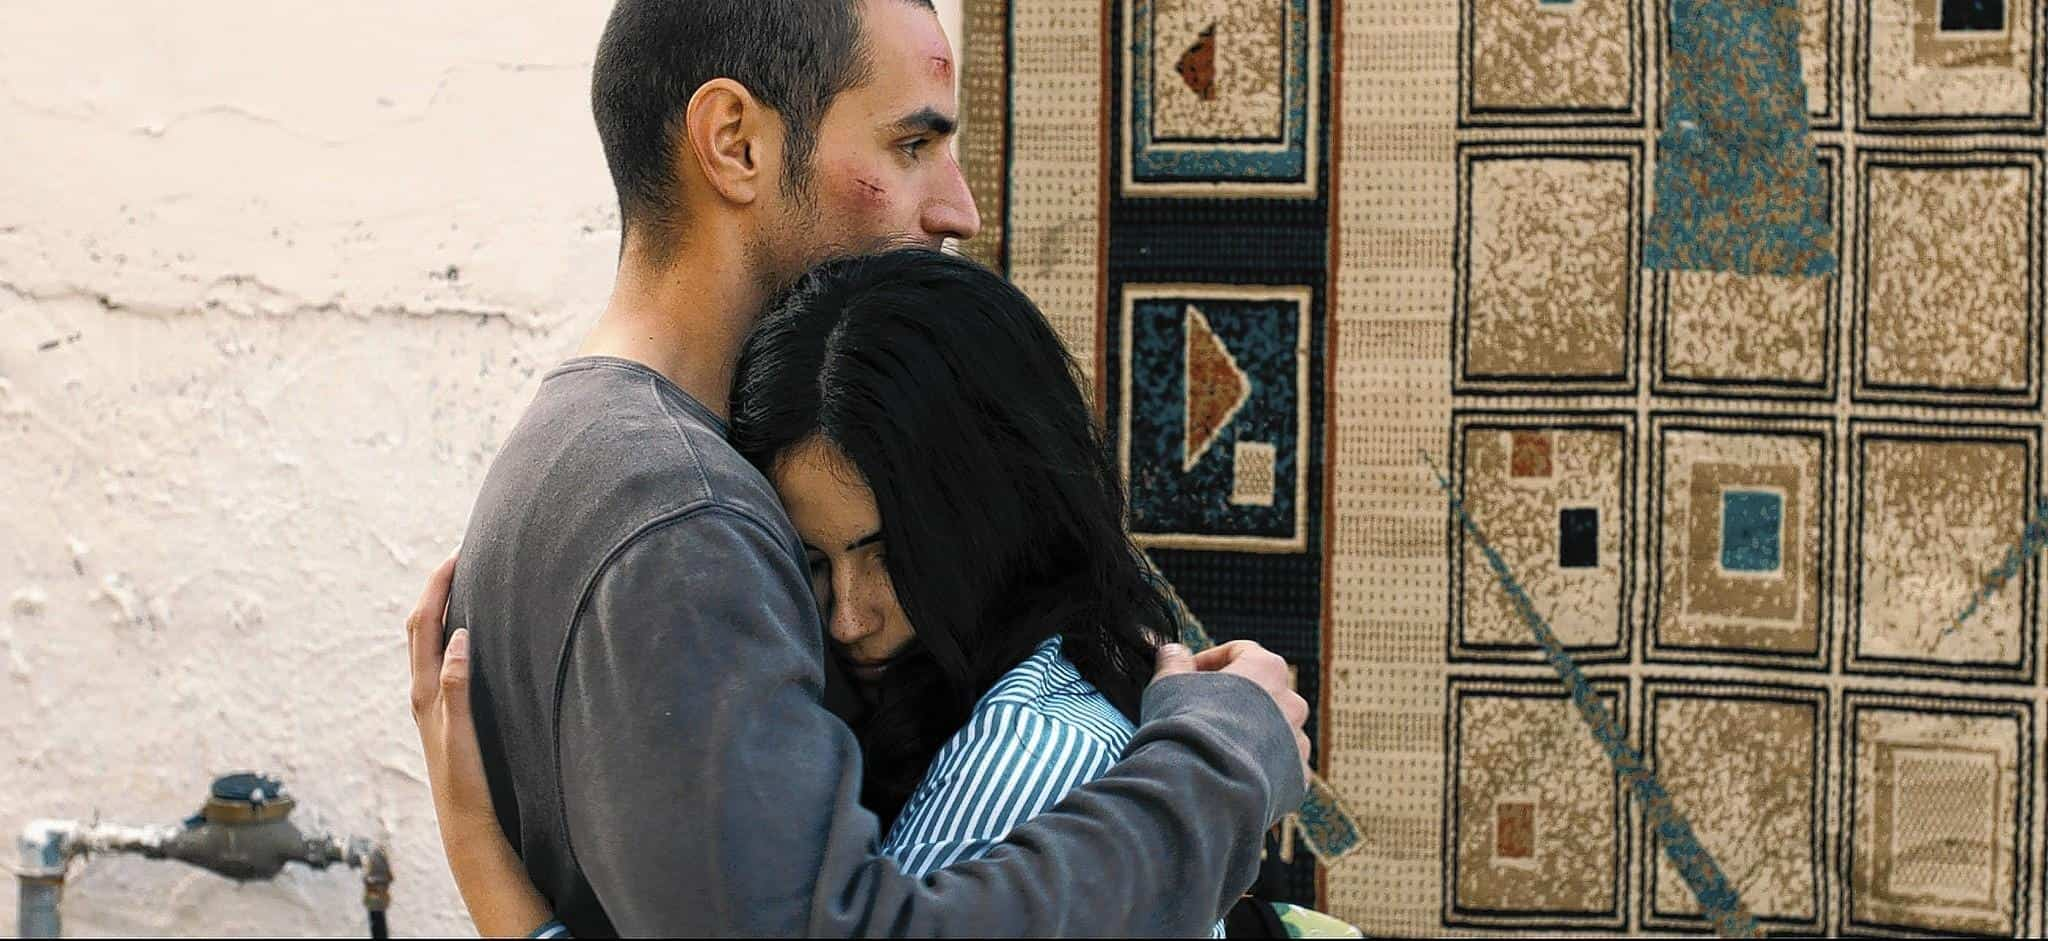 film mediorientali